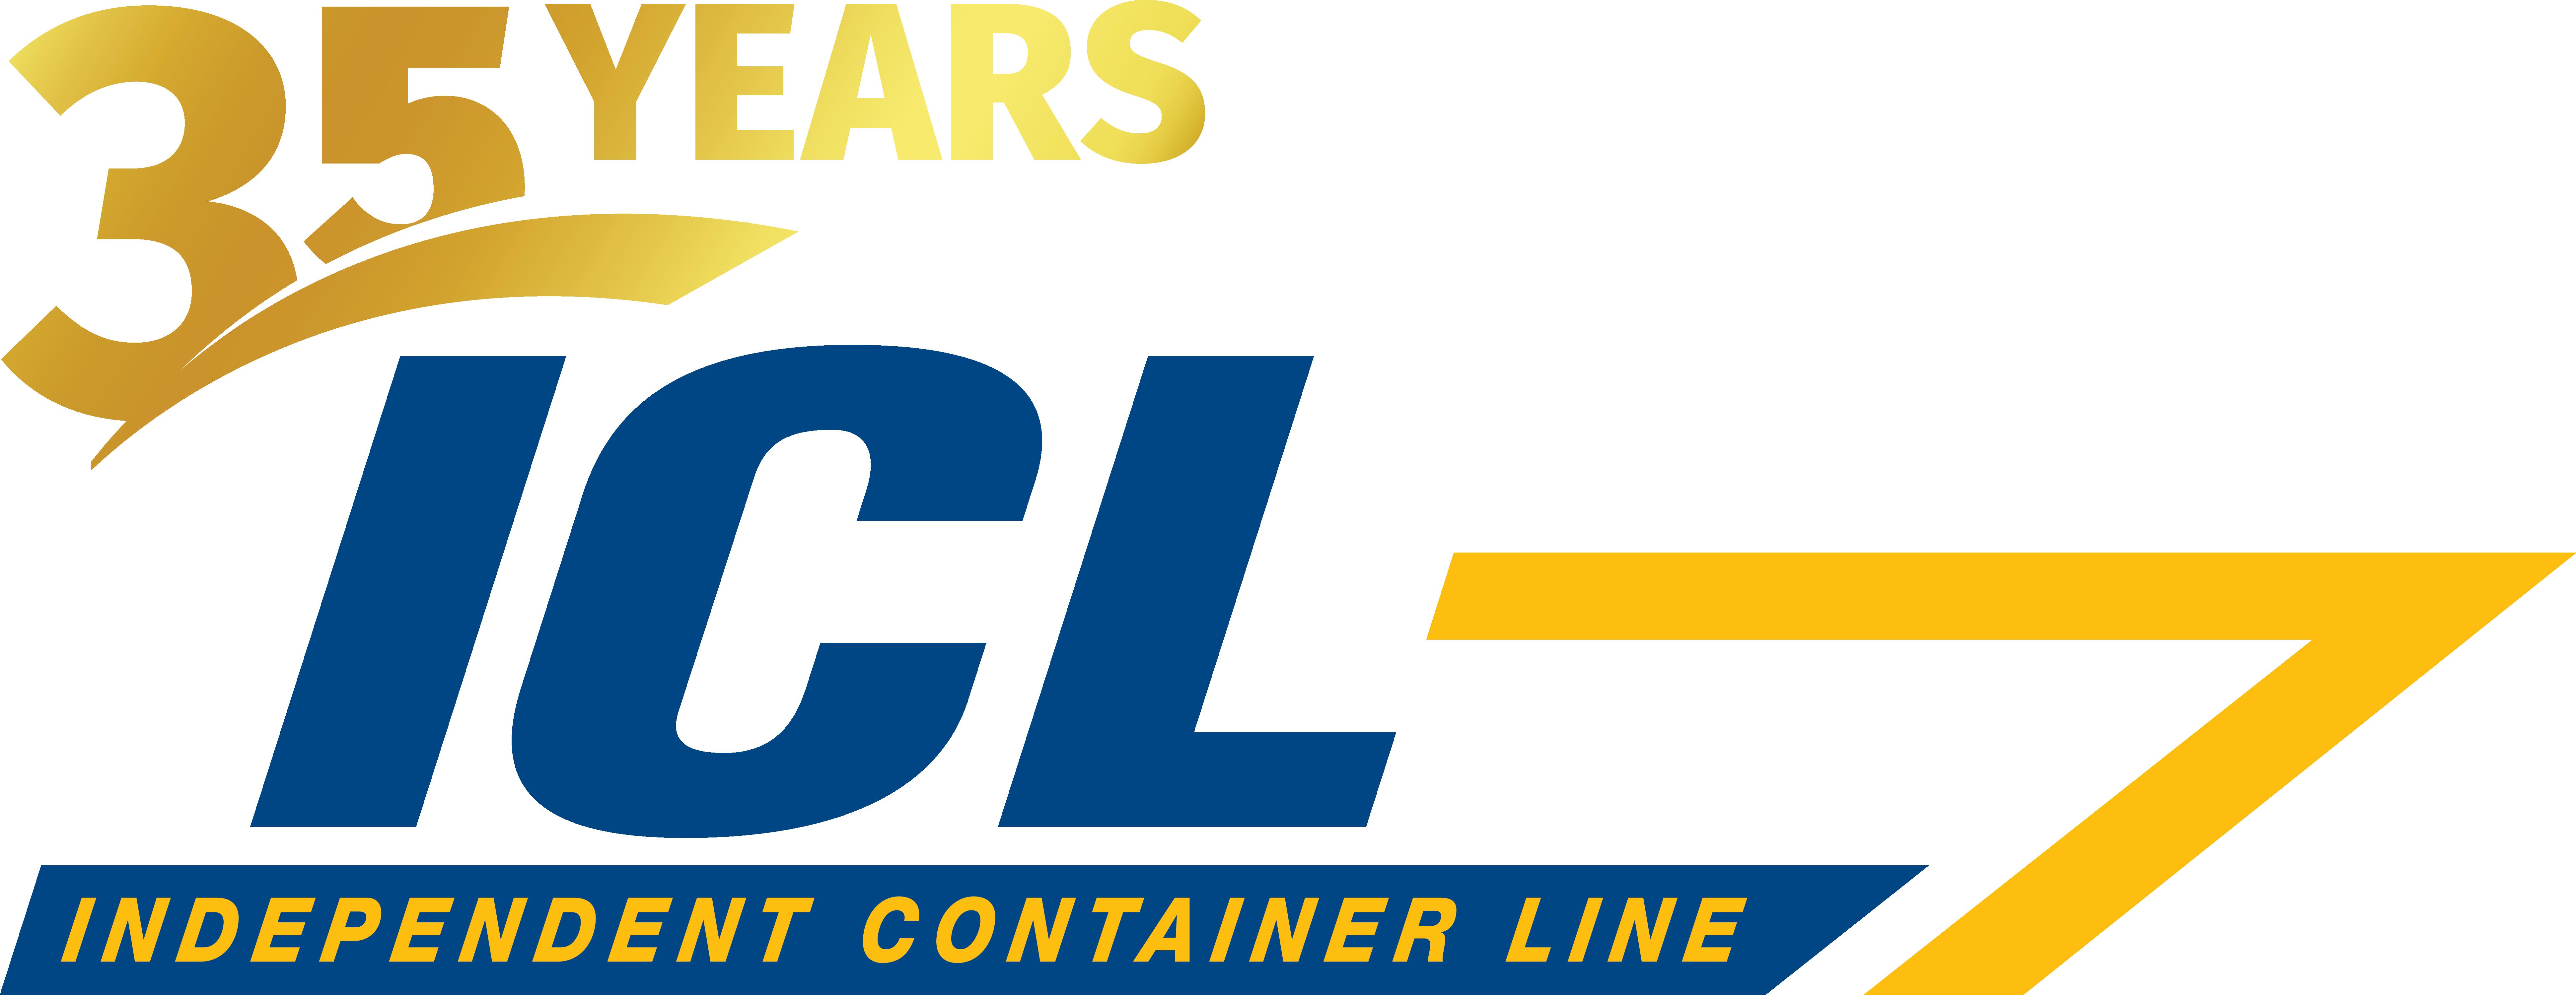 Independent Container Line Ltd. logo